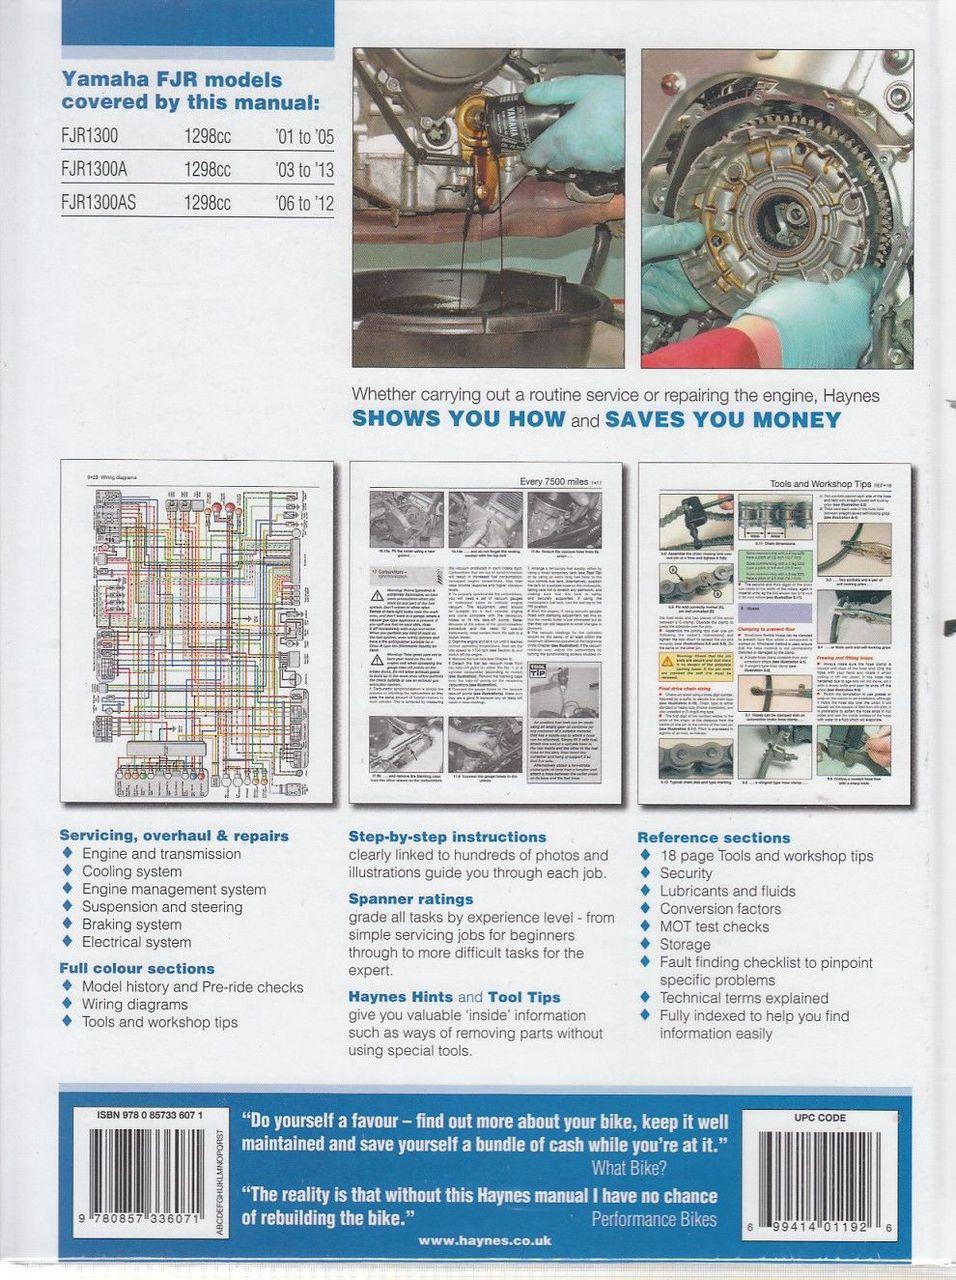 fjr wiring diagram manual e books Plug Wiring Diagram fjr wiring diagram wiring libraryyamaha fjr1300, fjr1300a, fjr1300as, 1298cc 2001 2013 workshop manual